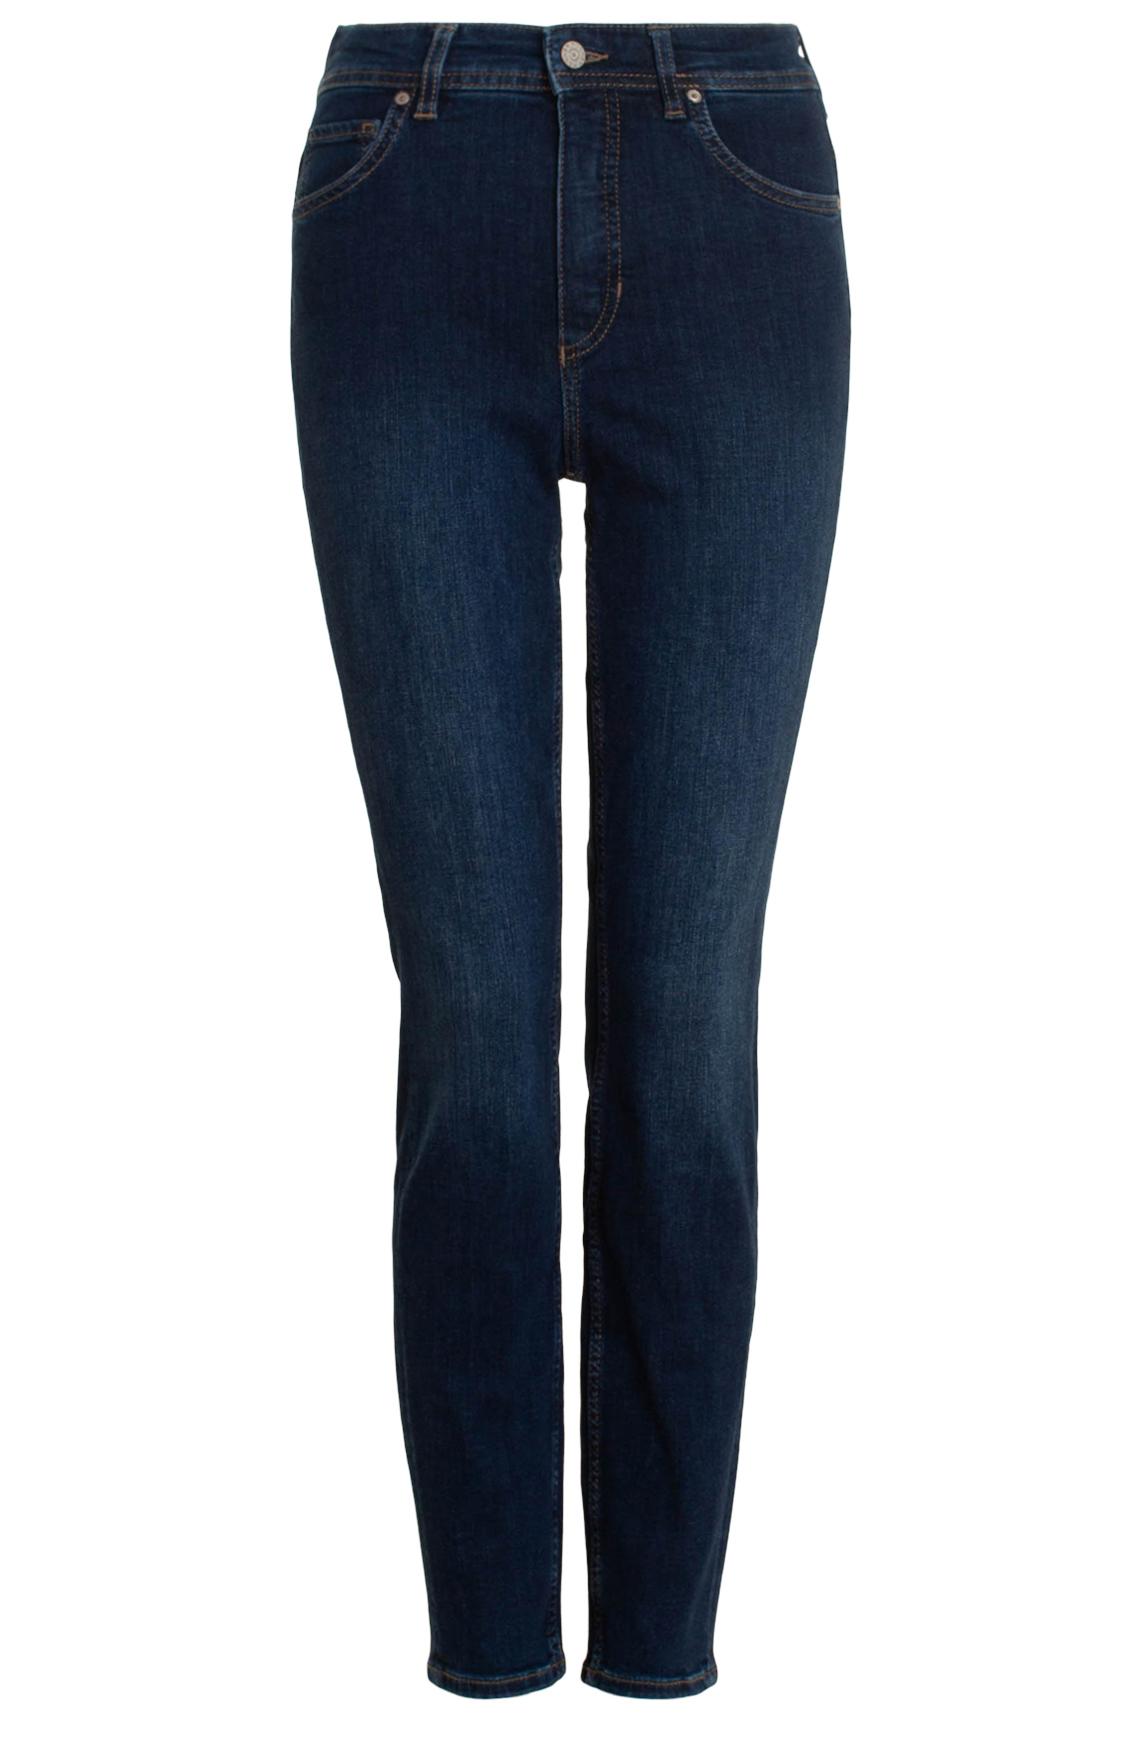 Rosner Dames Audrey high waist jeans L30 Blauw